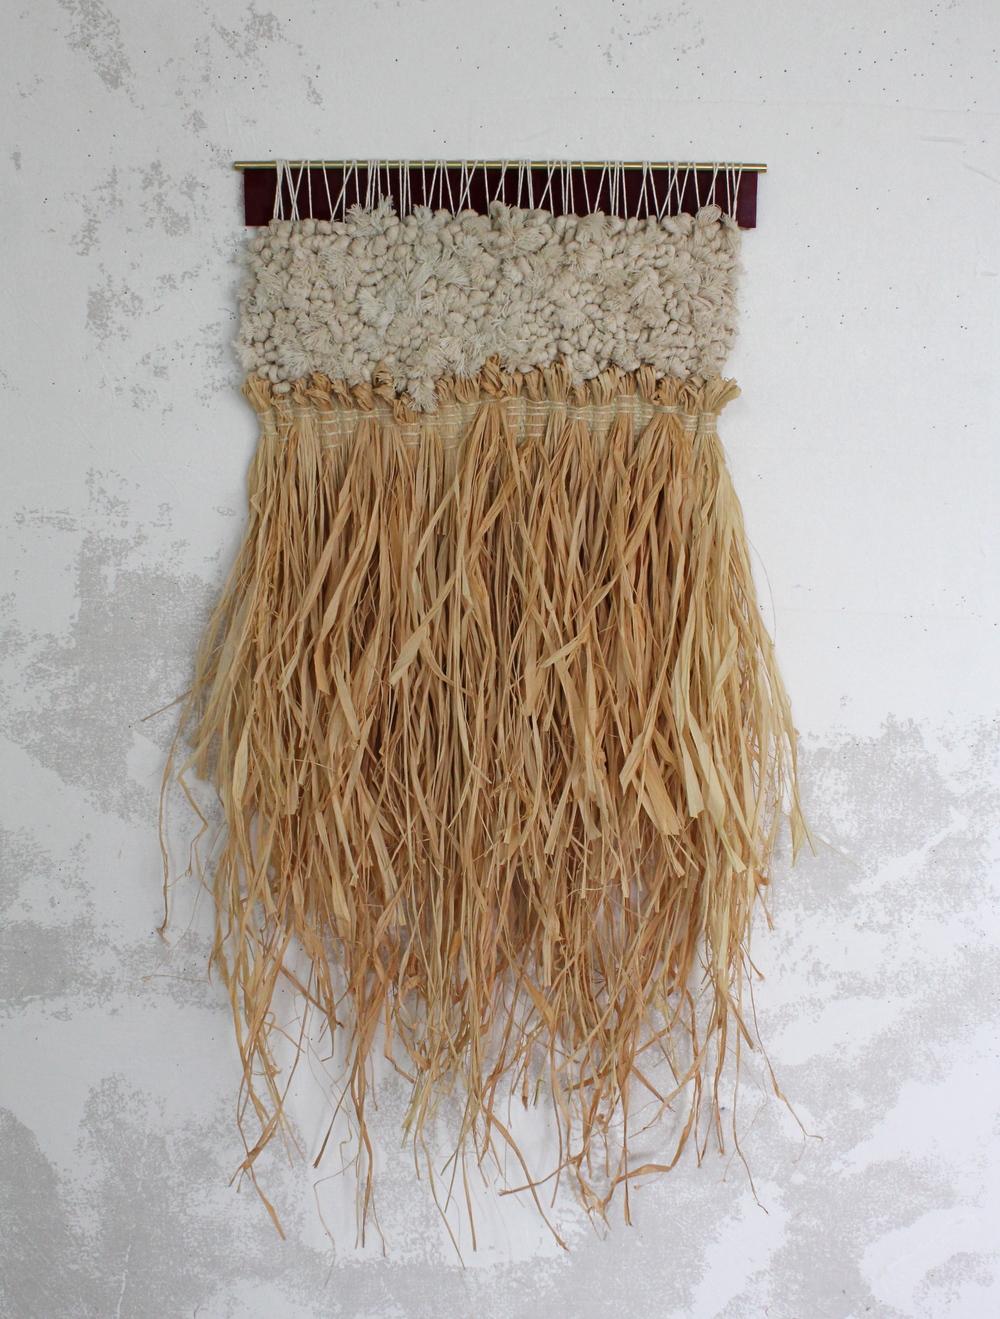 Chilao Weaving